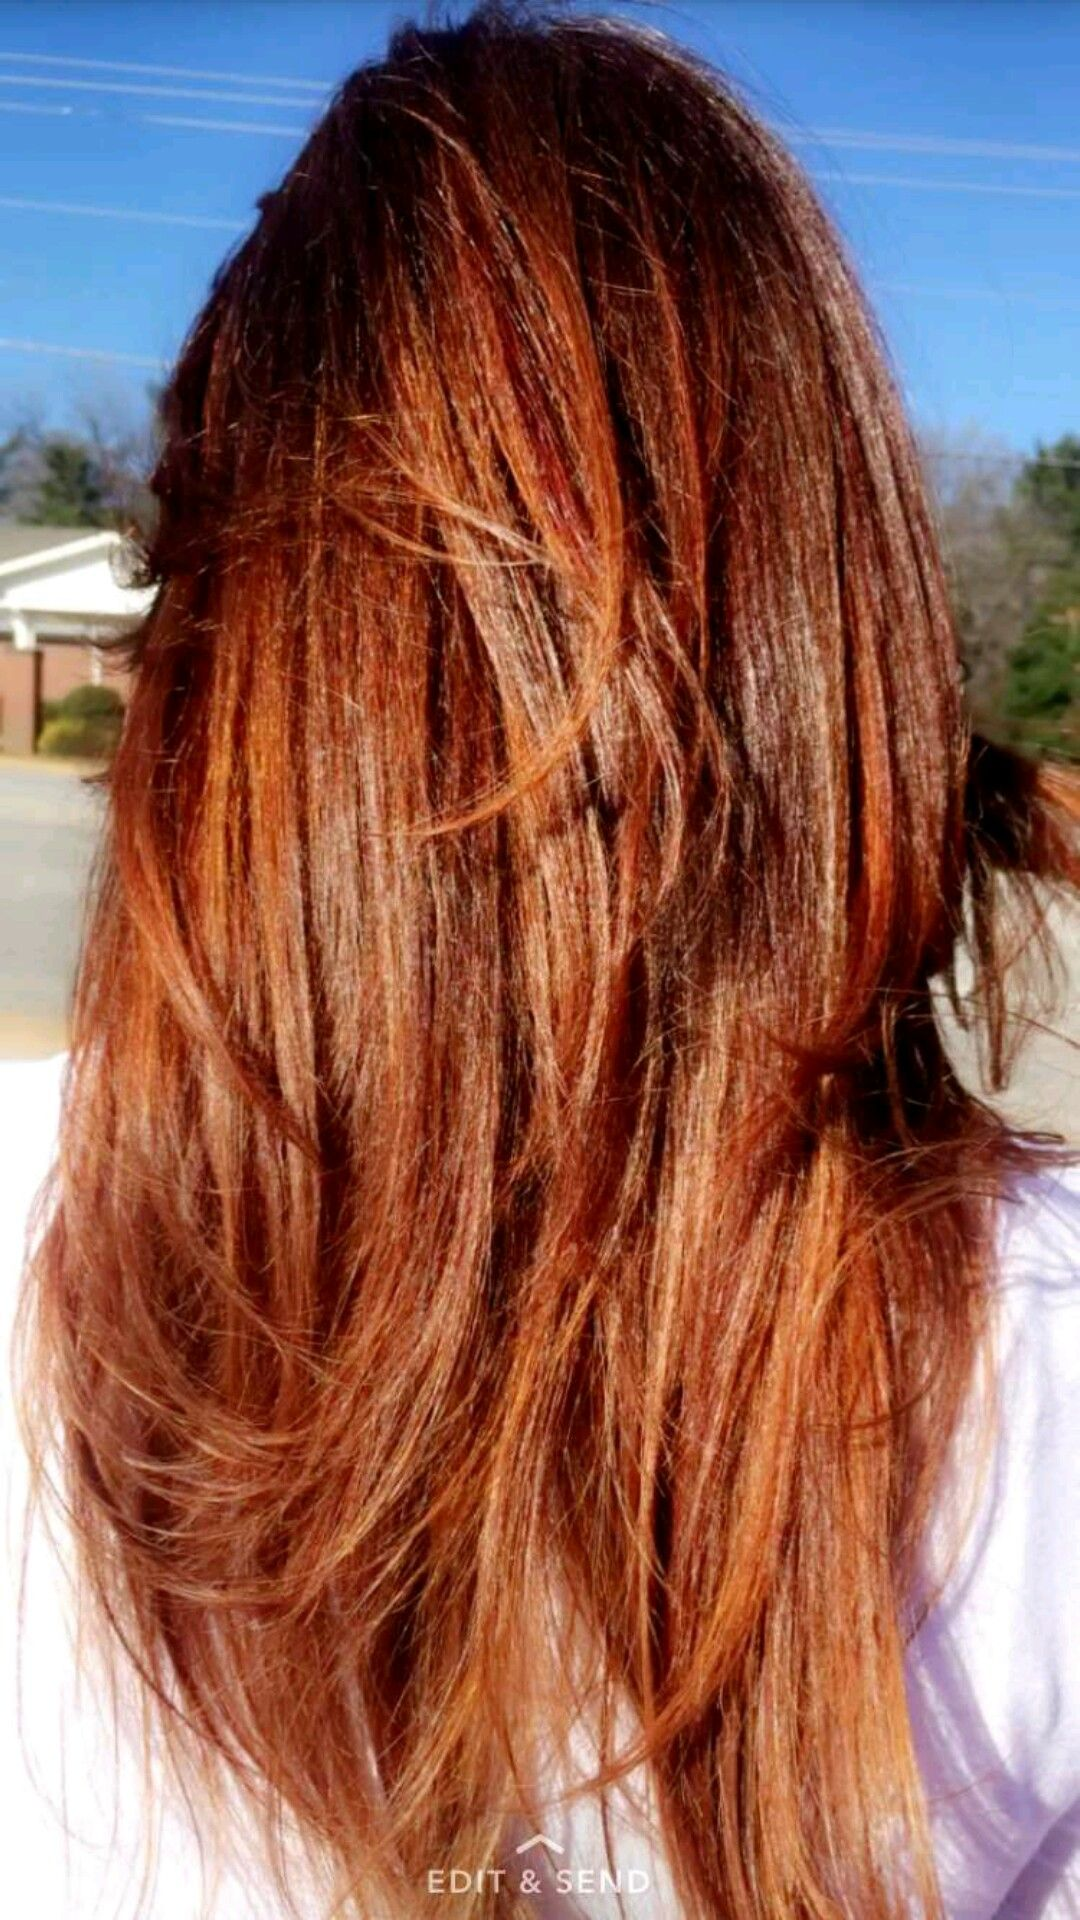 Auburn hair with copper highlights